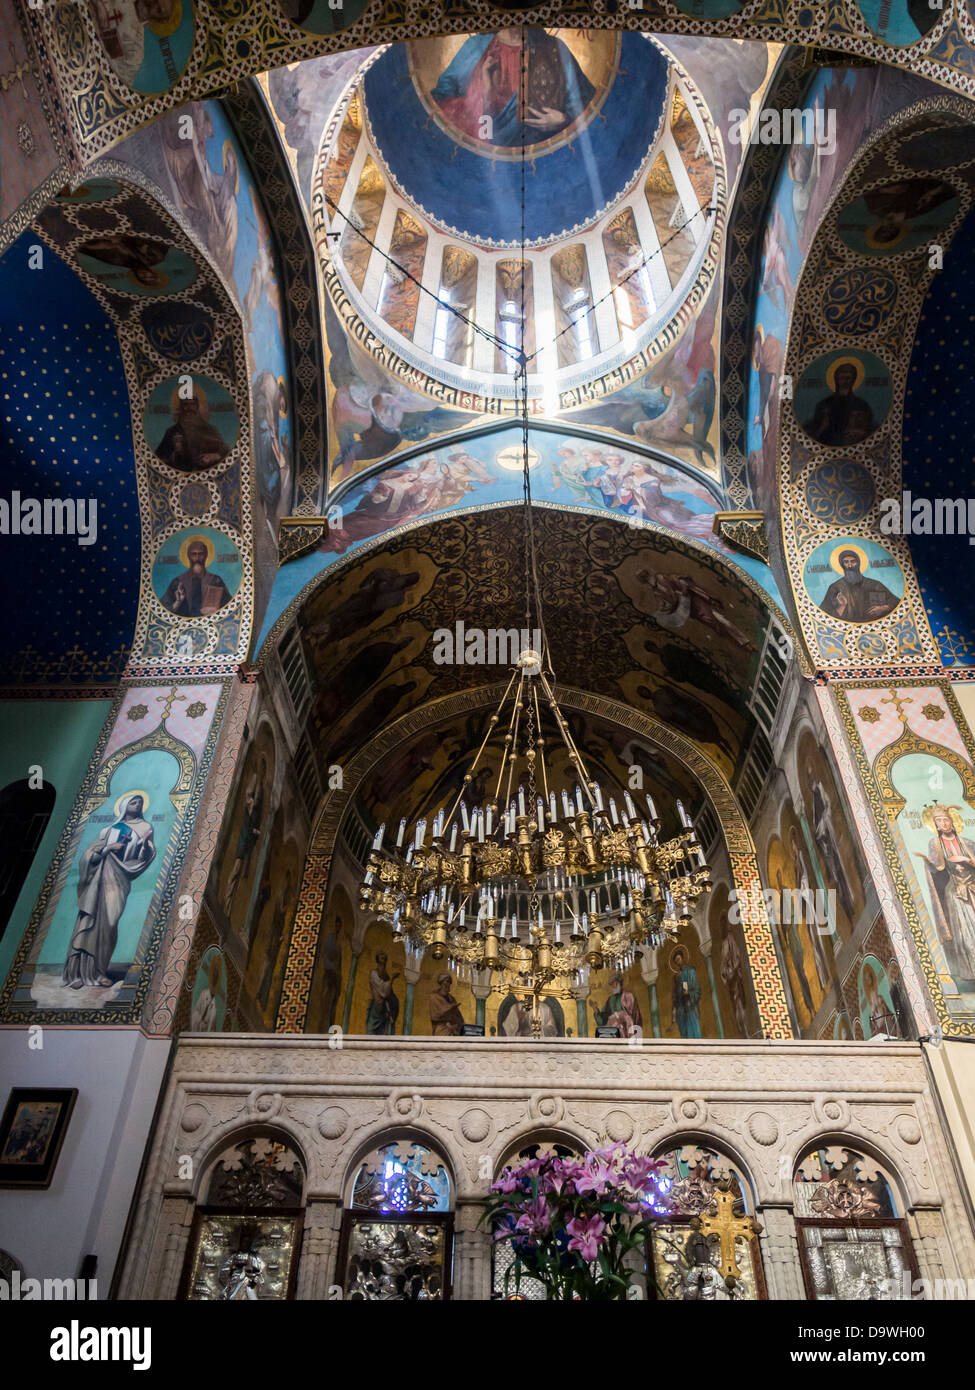 The Sioni Cathedral in Tbilisi, Georgia. Stock Photo